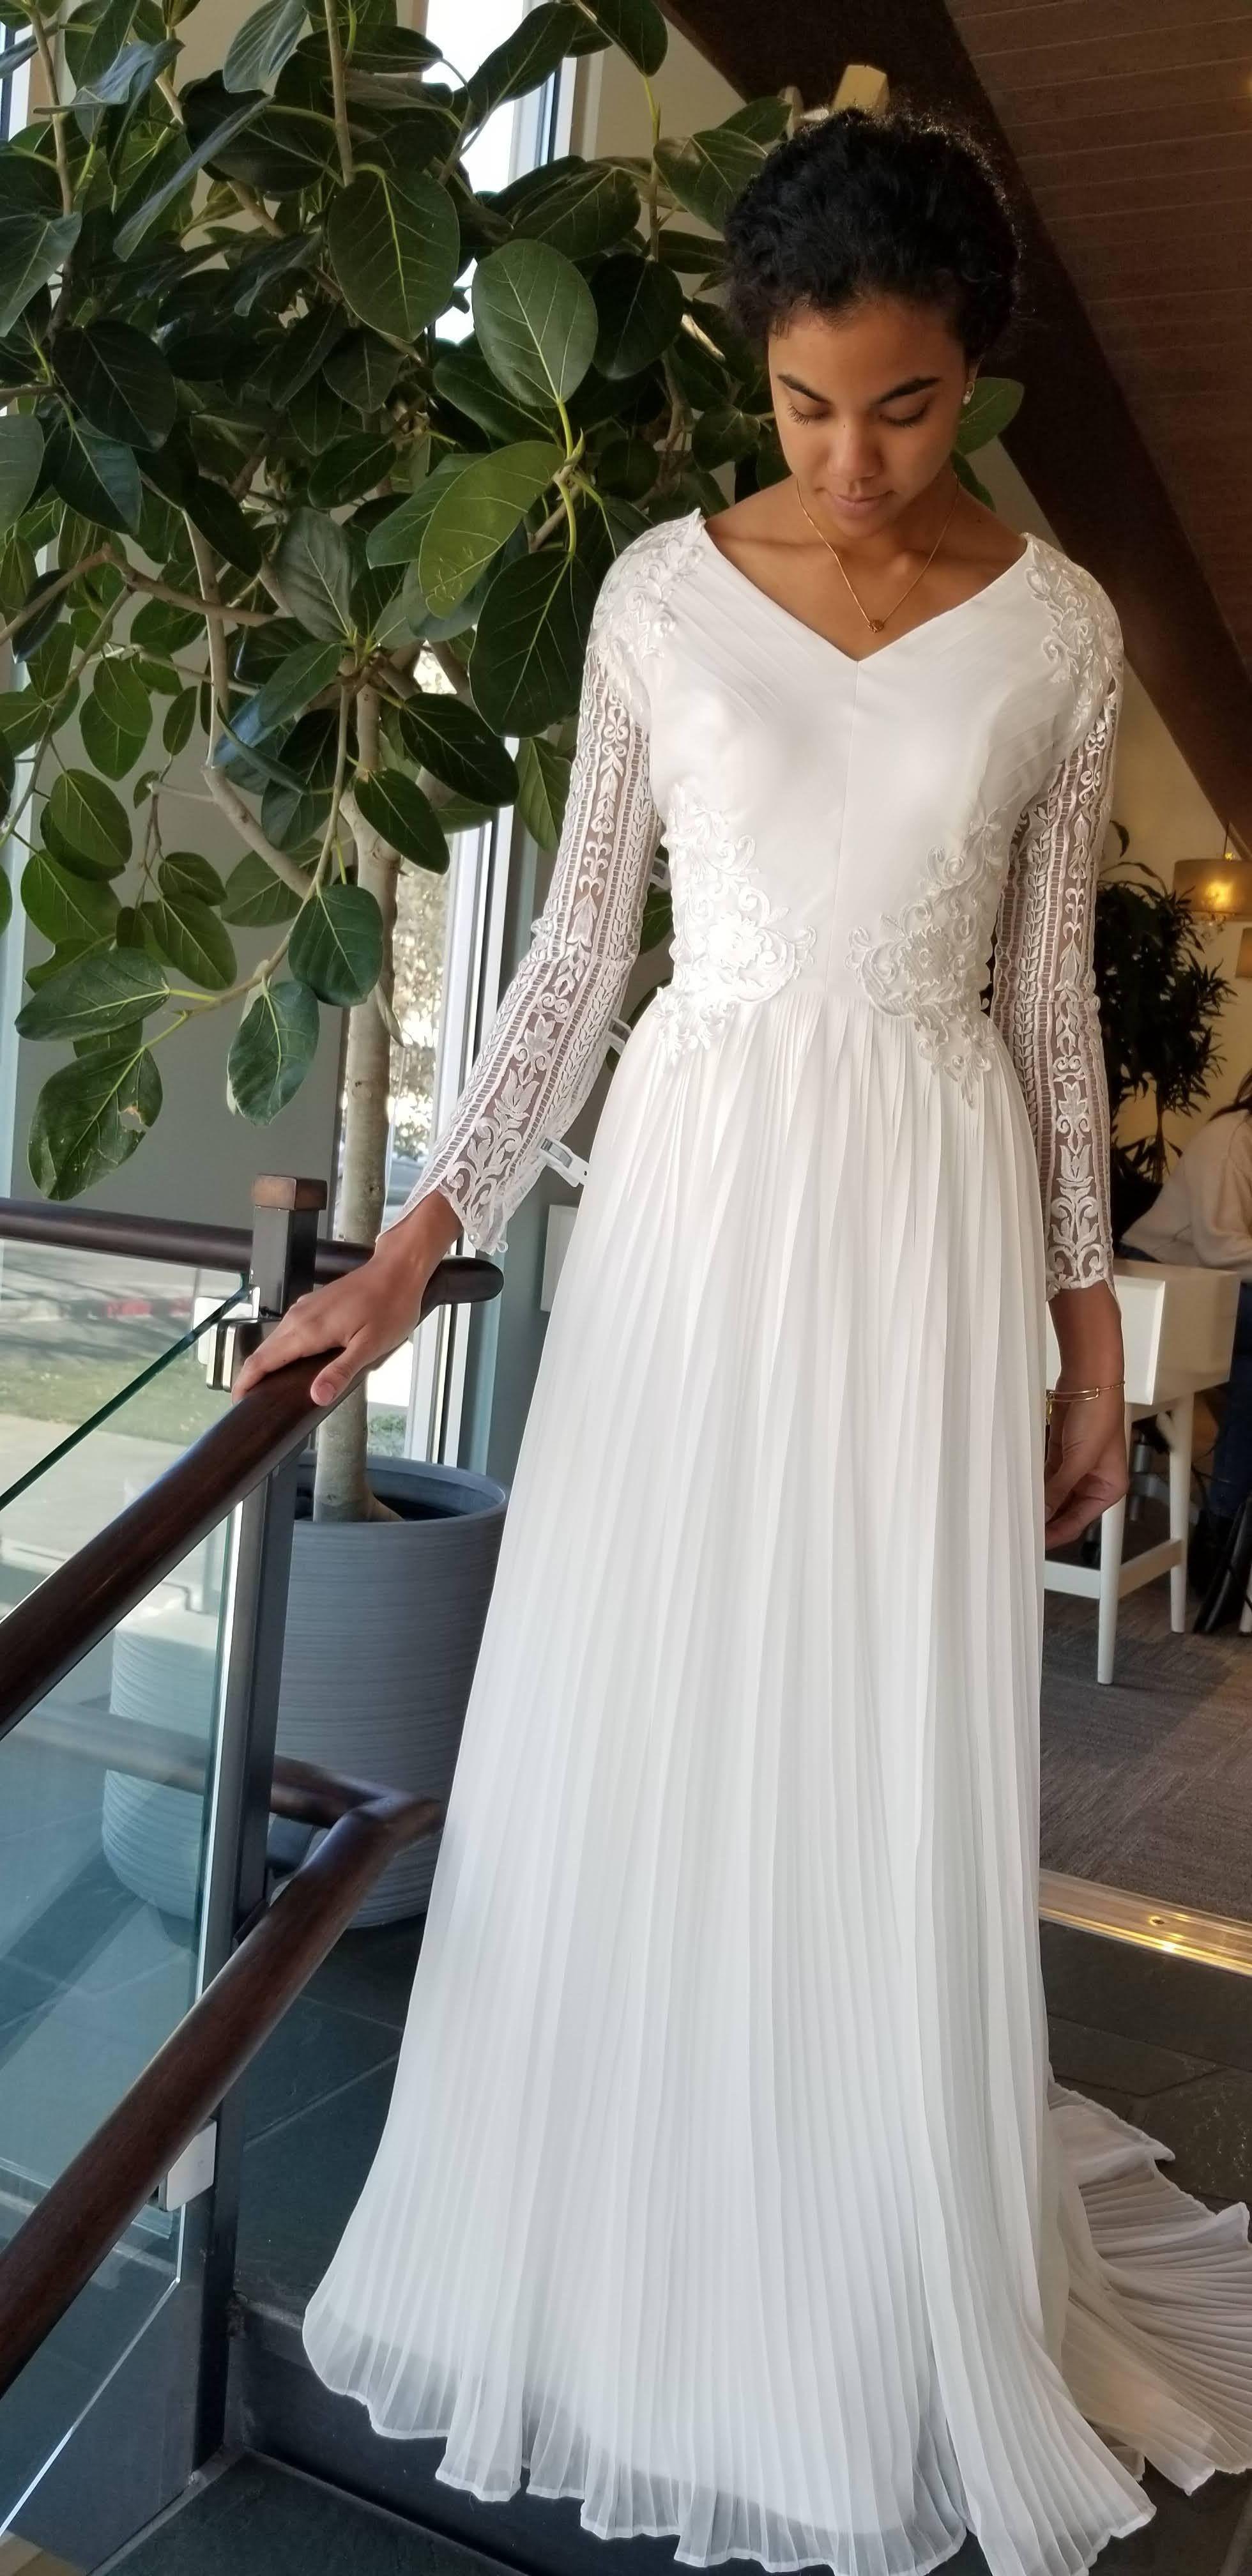 Pleated Flowy Skirt In 2020 Modest Wedding Dresses Customizable Wedding Dress Wedding Dress With Pockets